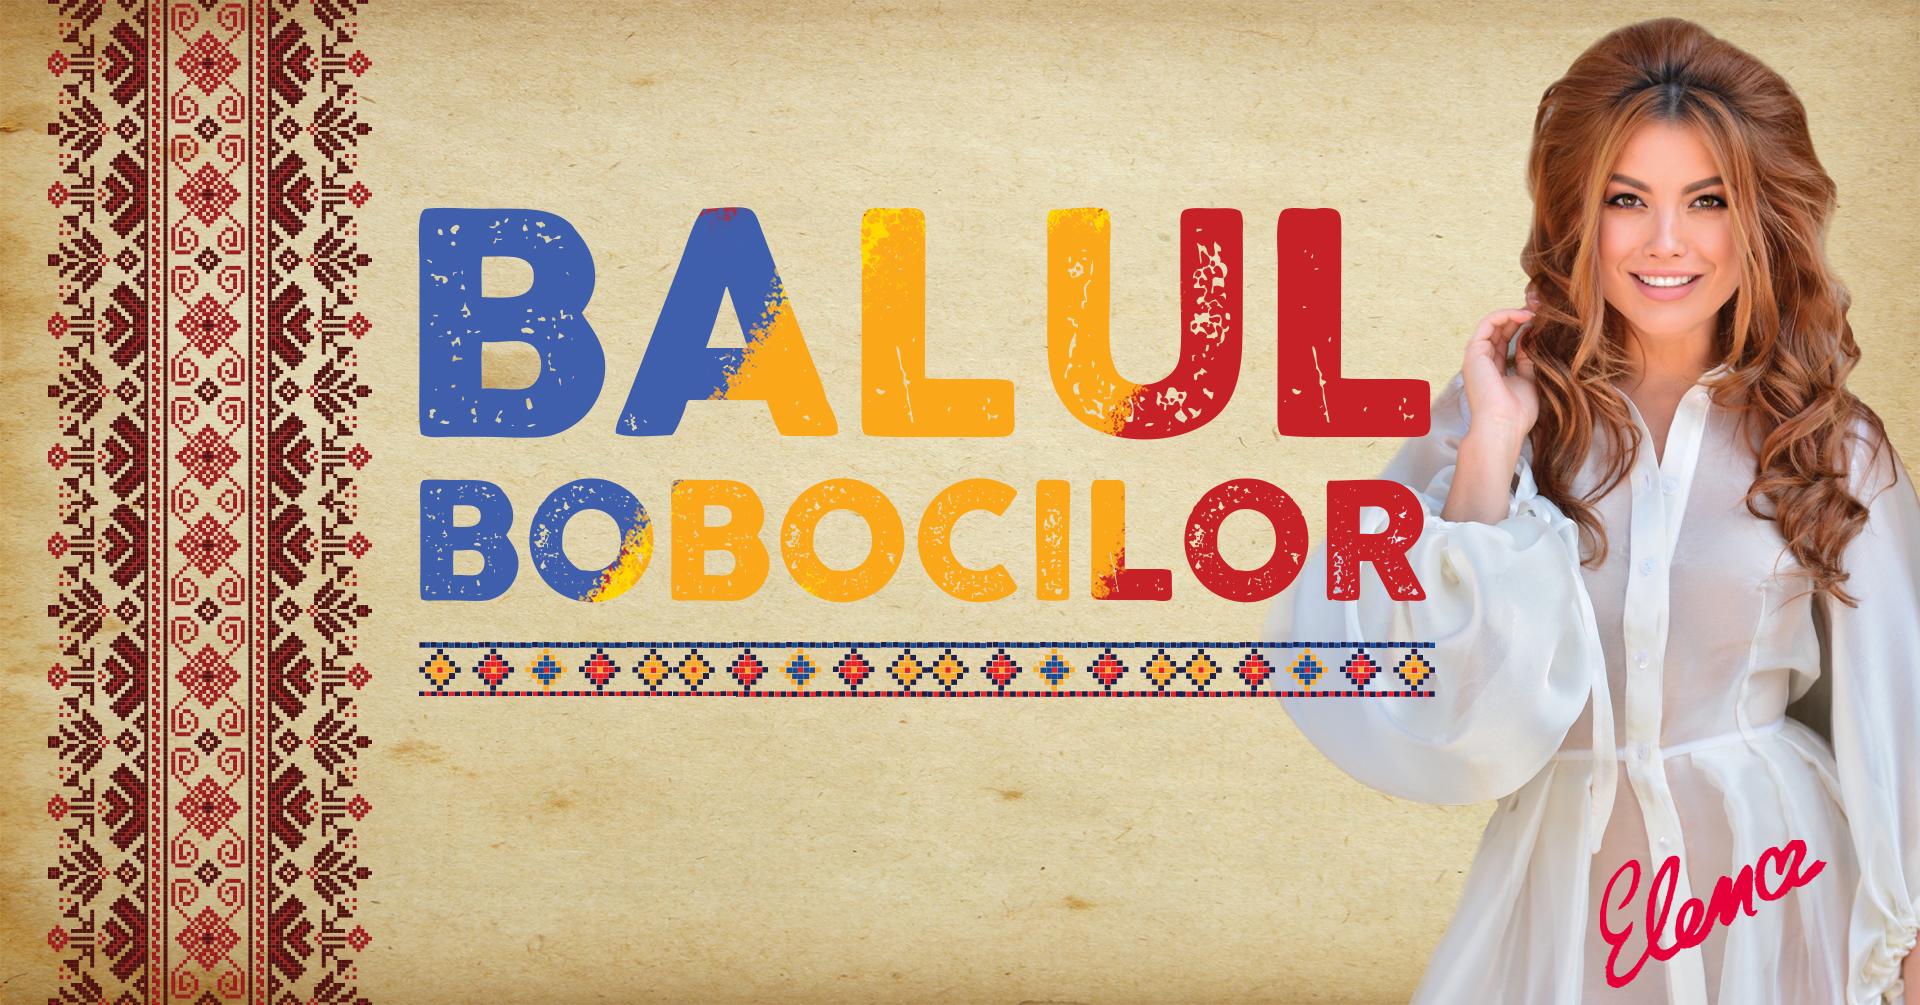 Vot Popularitate Balul Bobocilor 2019